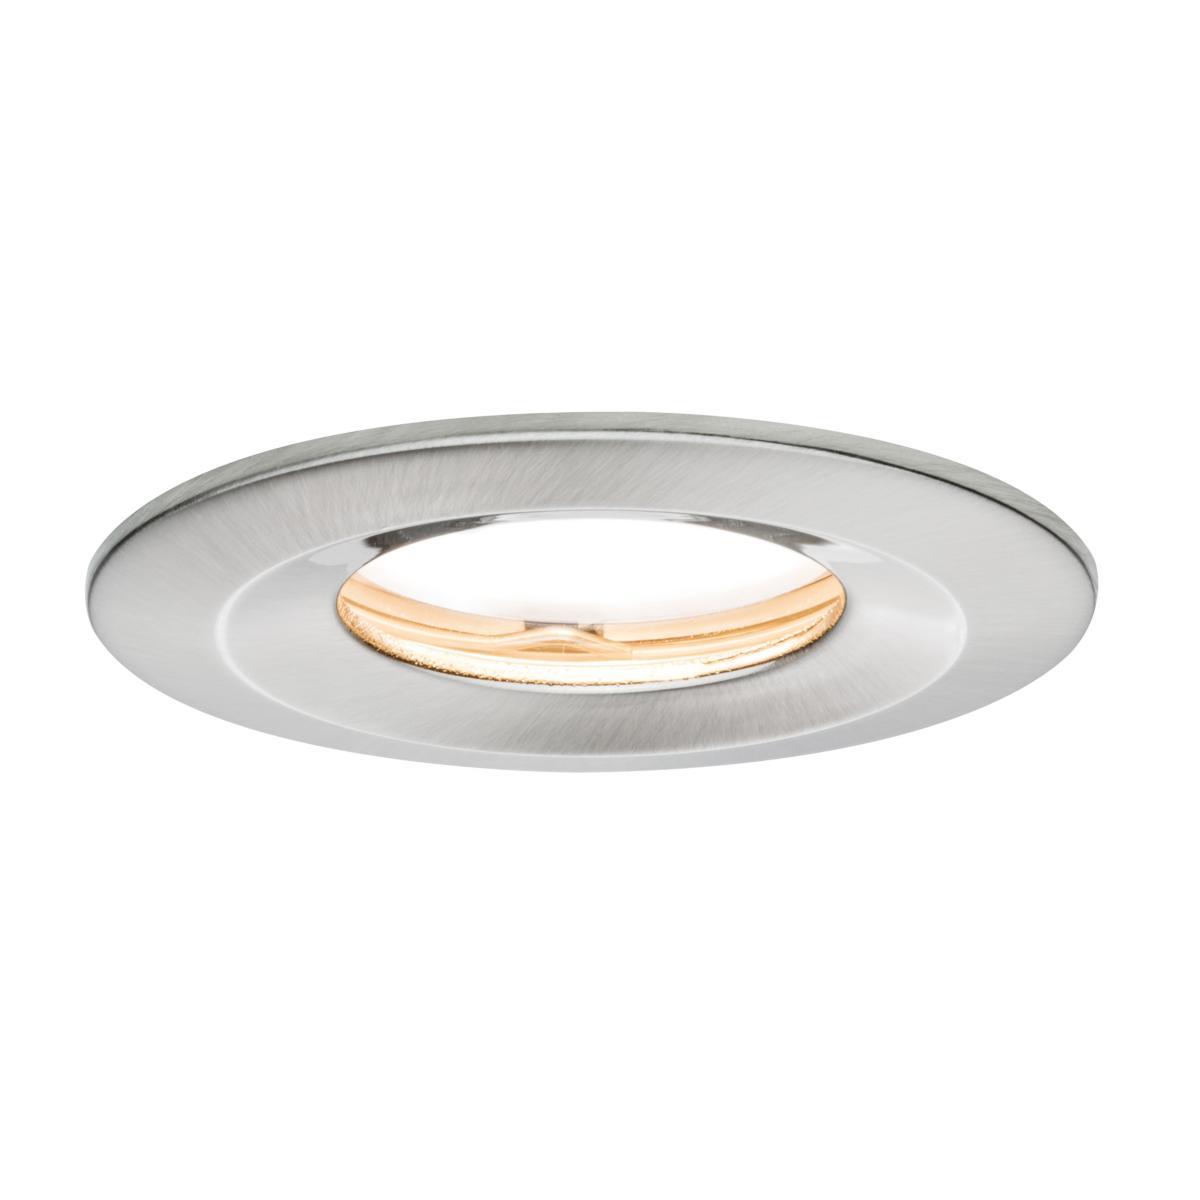 spot led ip65 encastrable dimmable slim coin 6 8w 230v paulmann 93882. Black Bedroom Furniture Sets. Home Design Ideas